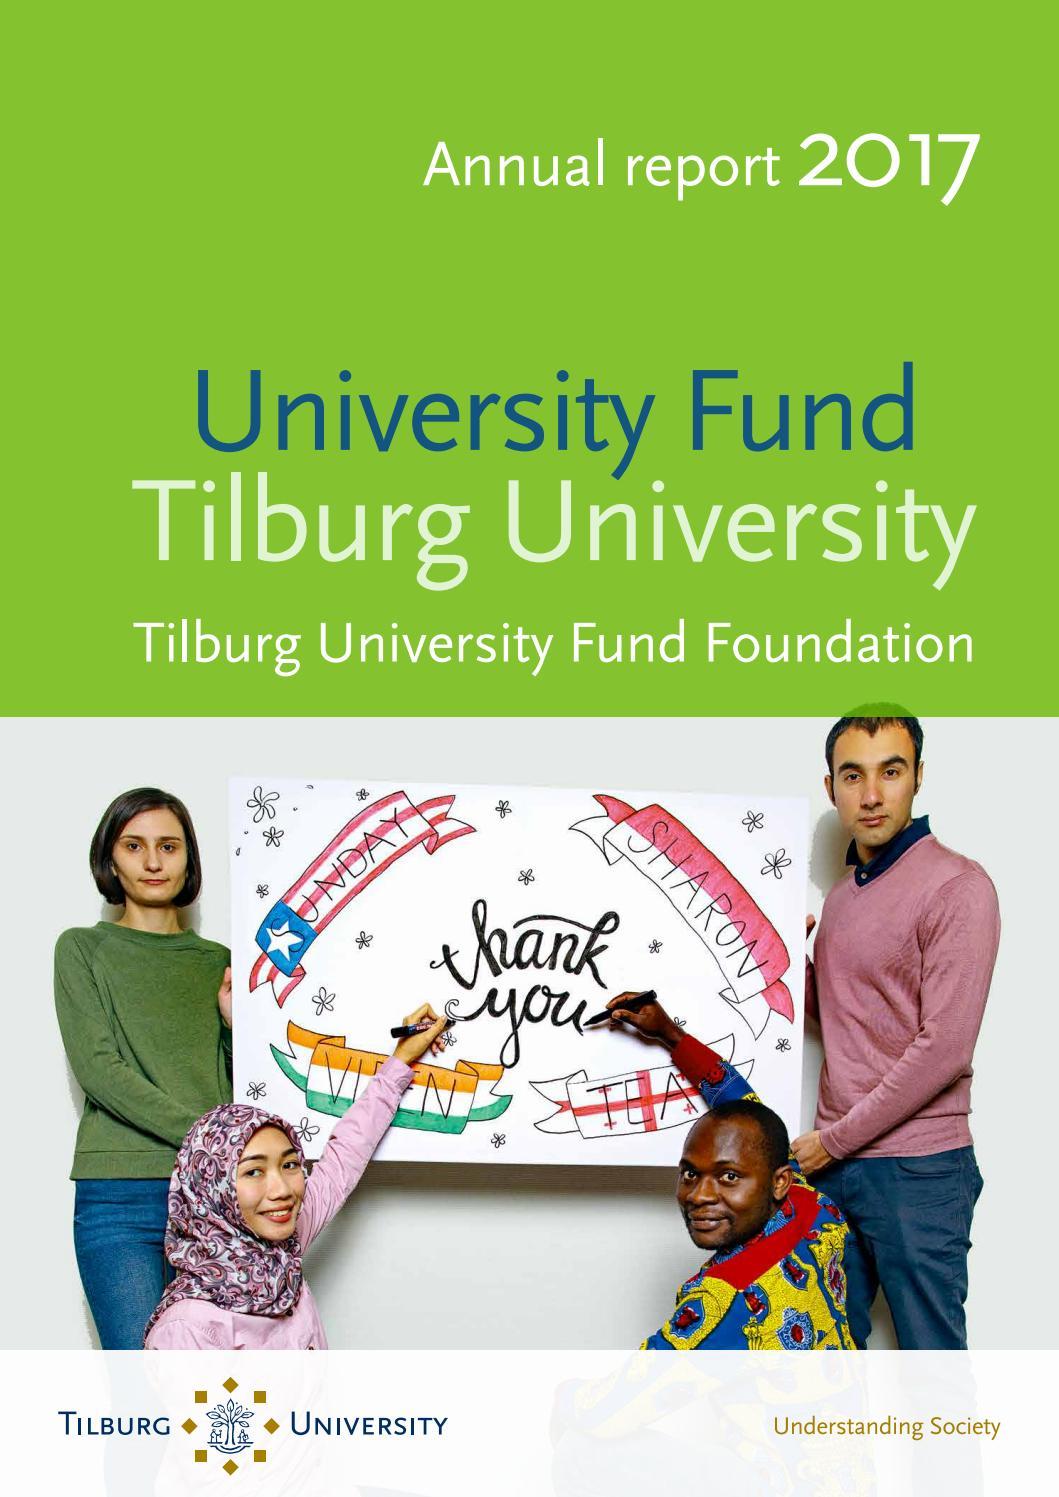 Annual Report 2017 Tilburg University Fund By Tilburg University Alumni Issuu